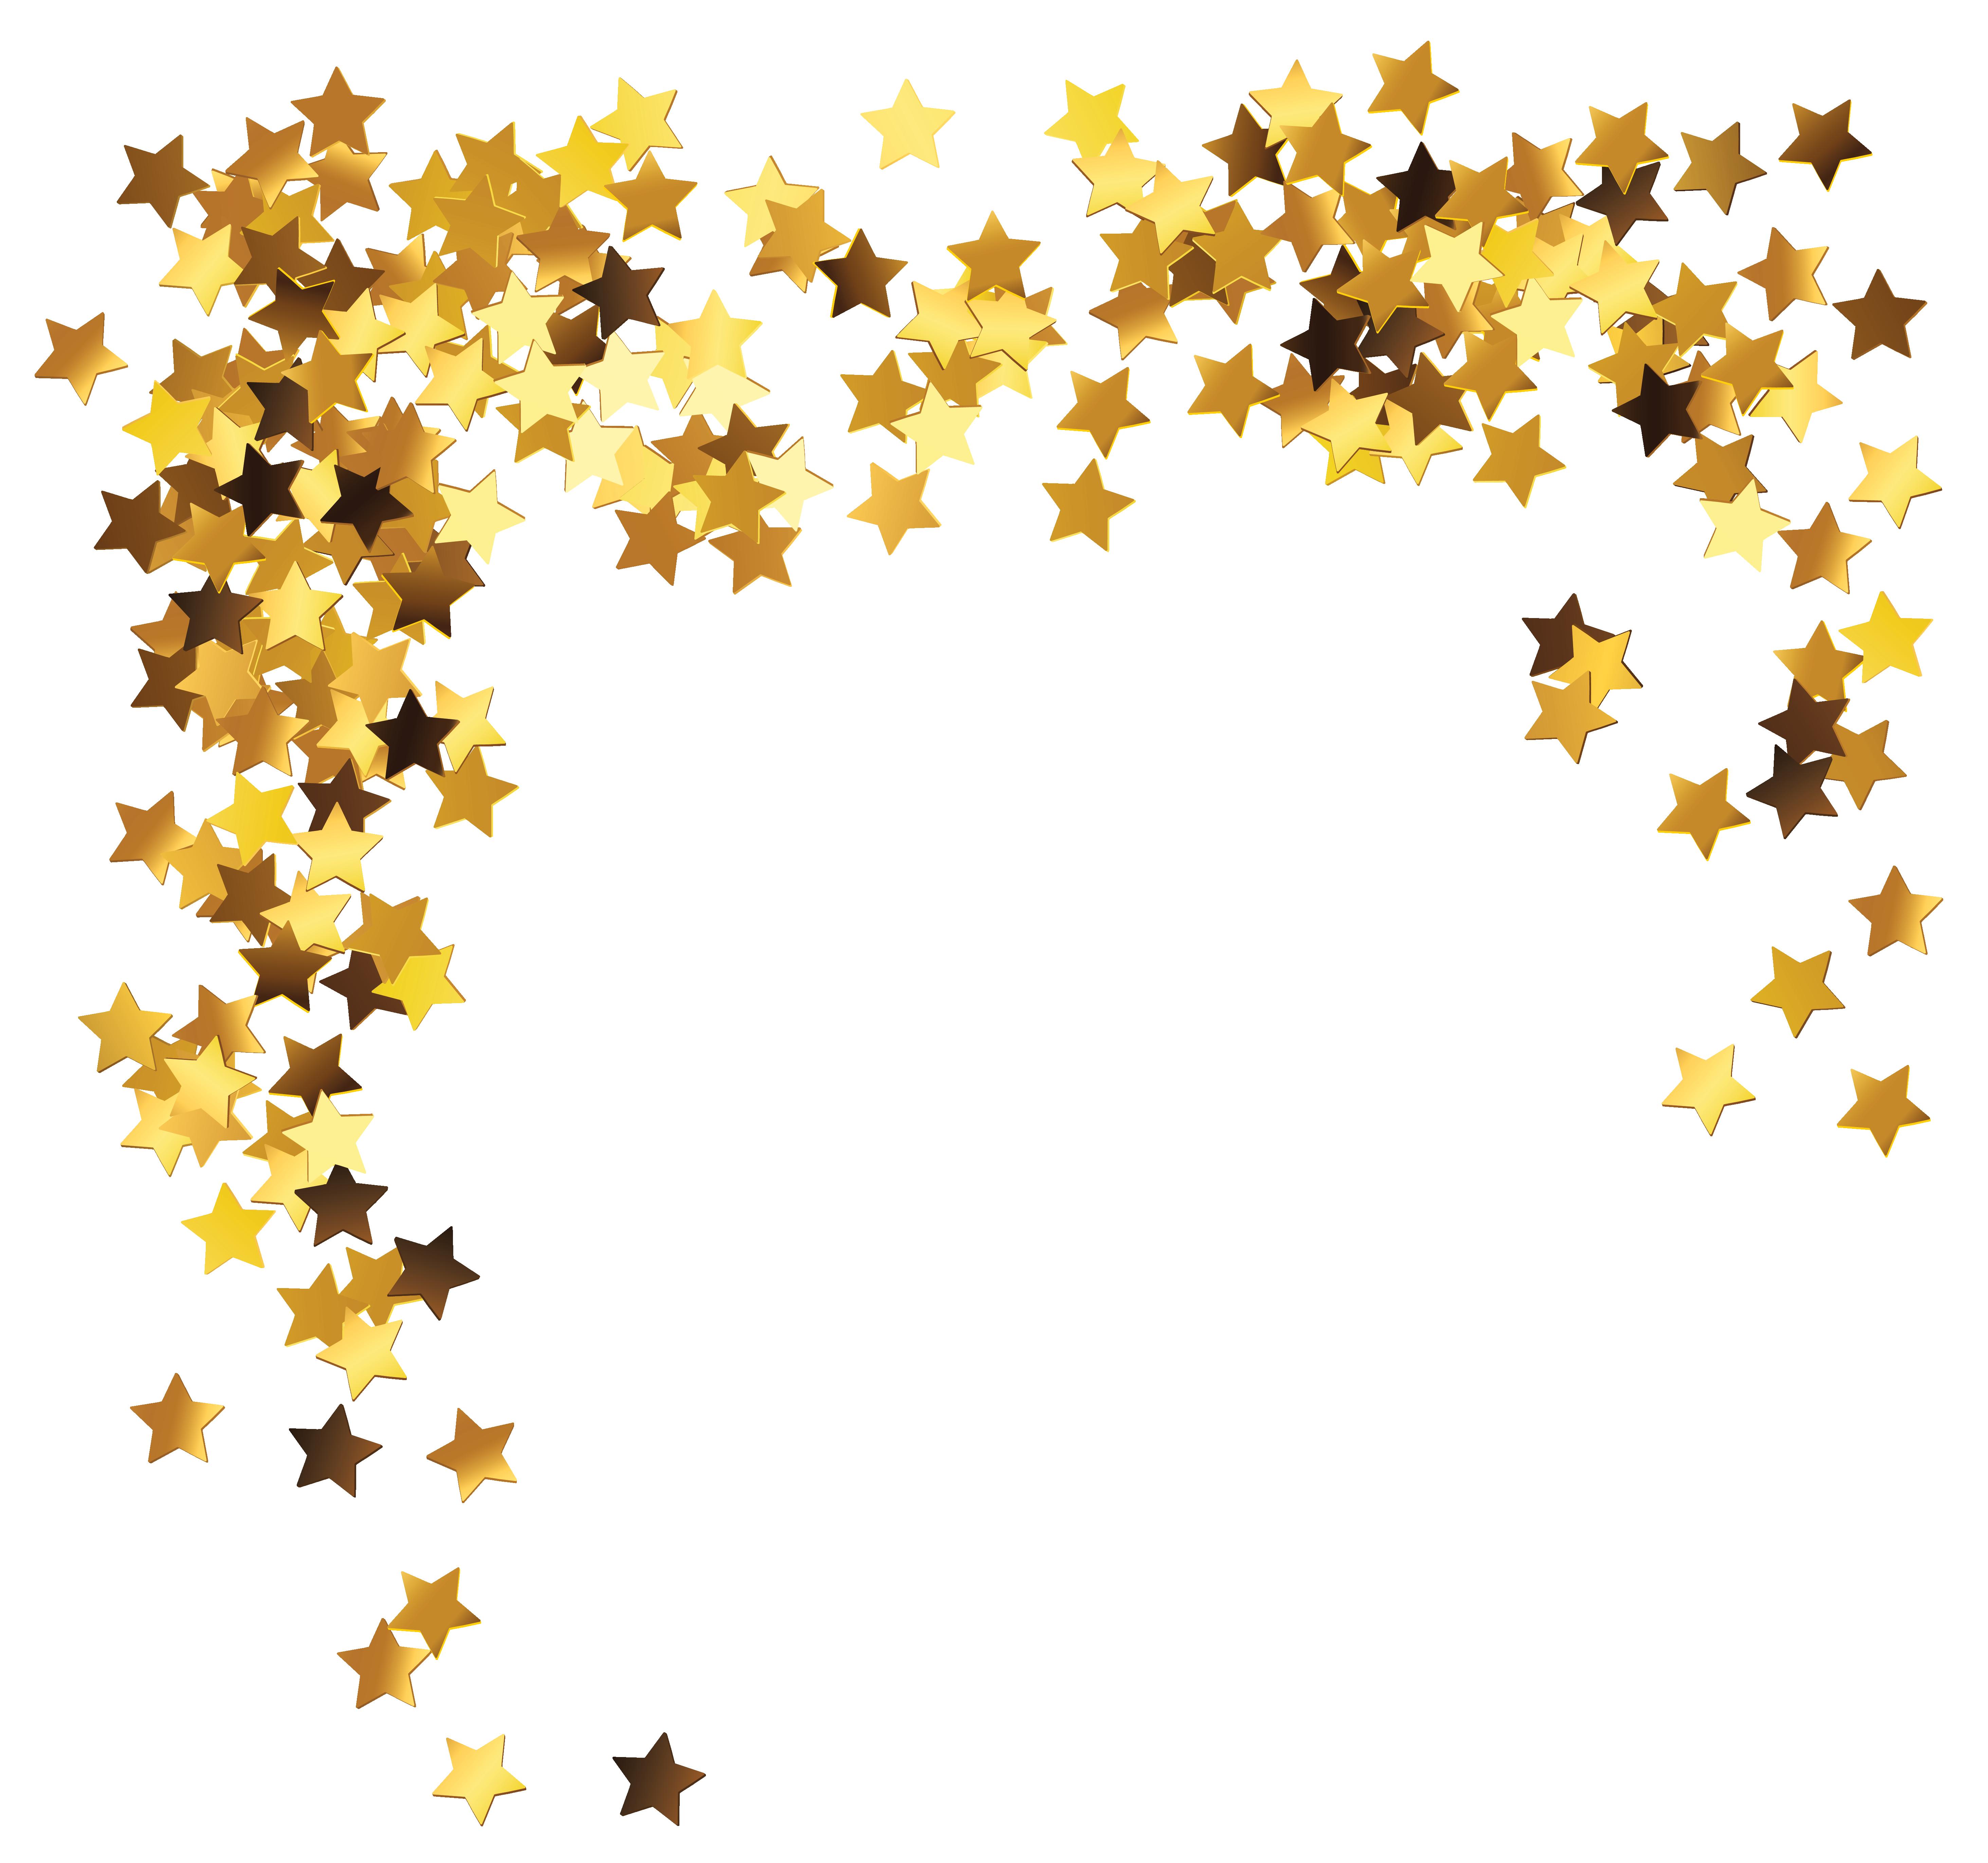 Arch clipart star #4